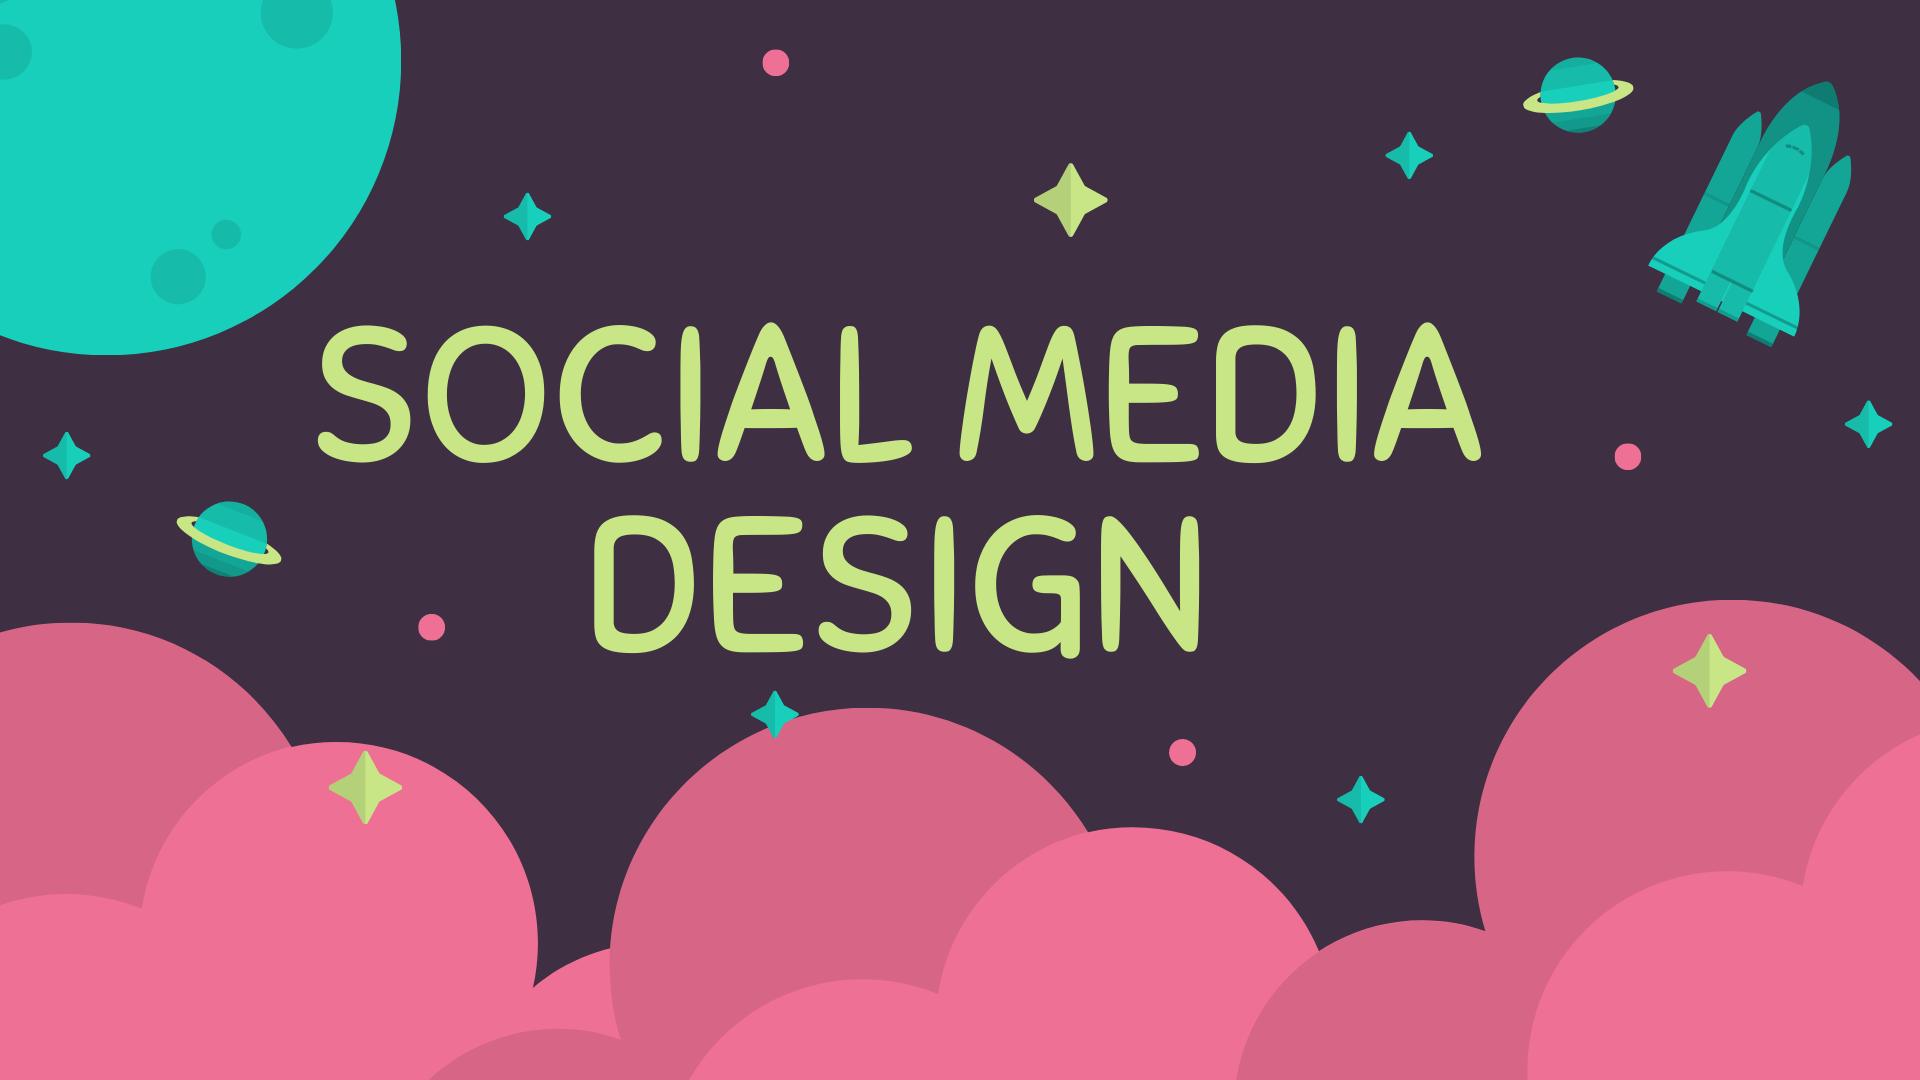 Influential Social Media Design